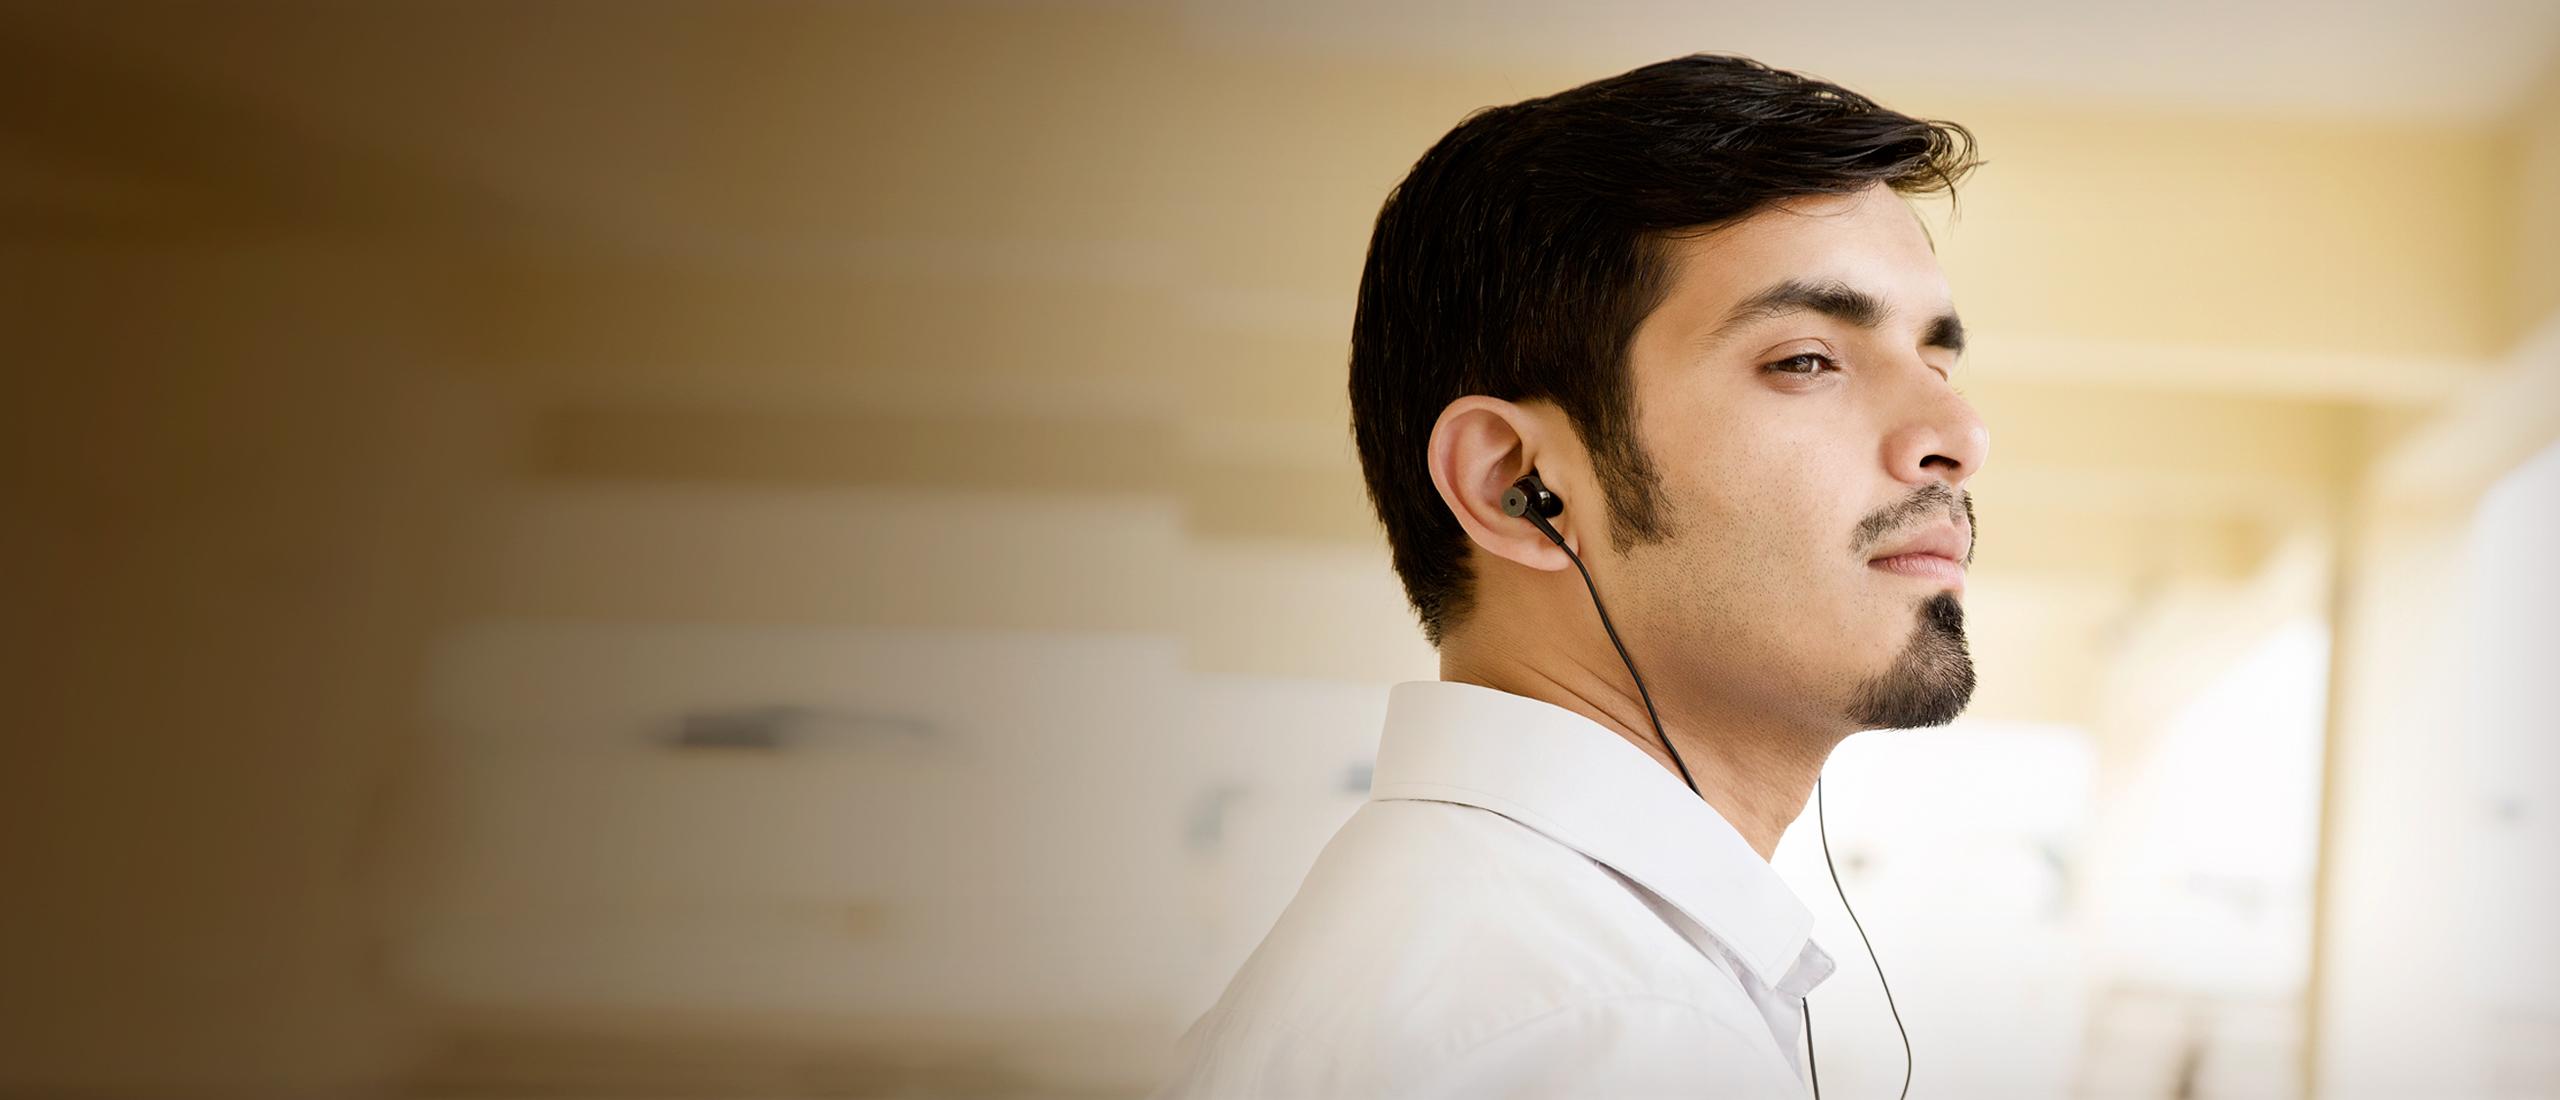 Mi Noise Cancelling Earphones Type C India Xiaomi Bluetooth Handsfree Headset Original Hensfri Henpri Xiomi Earphonestype